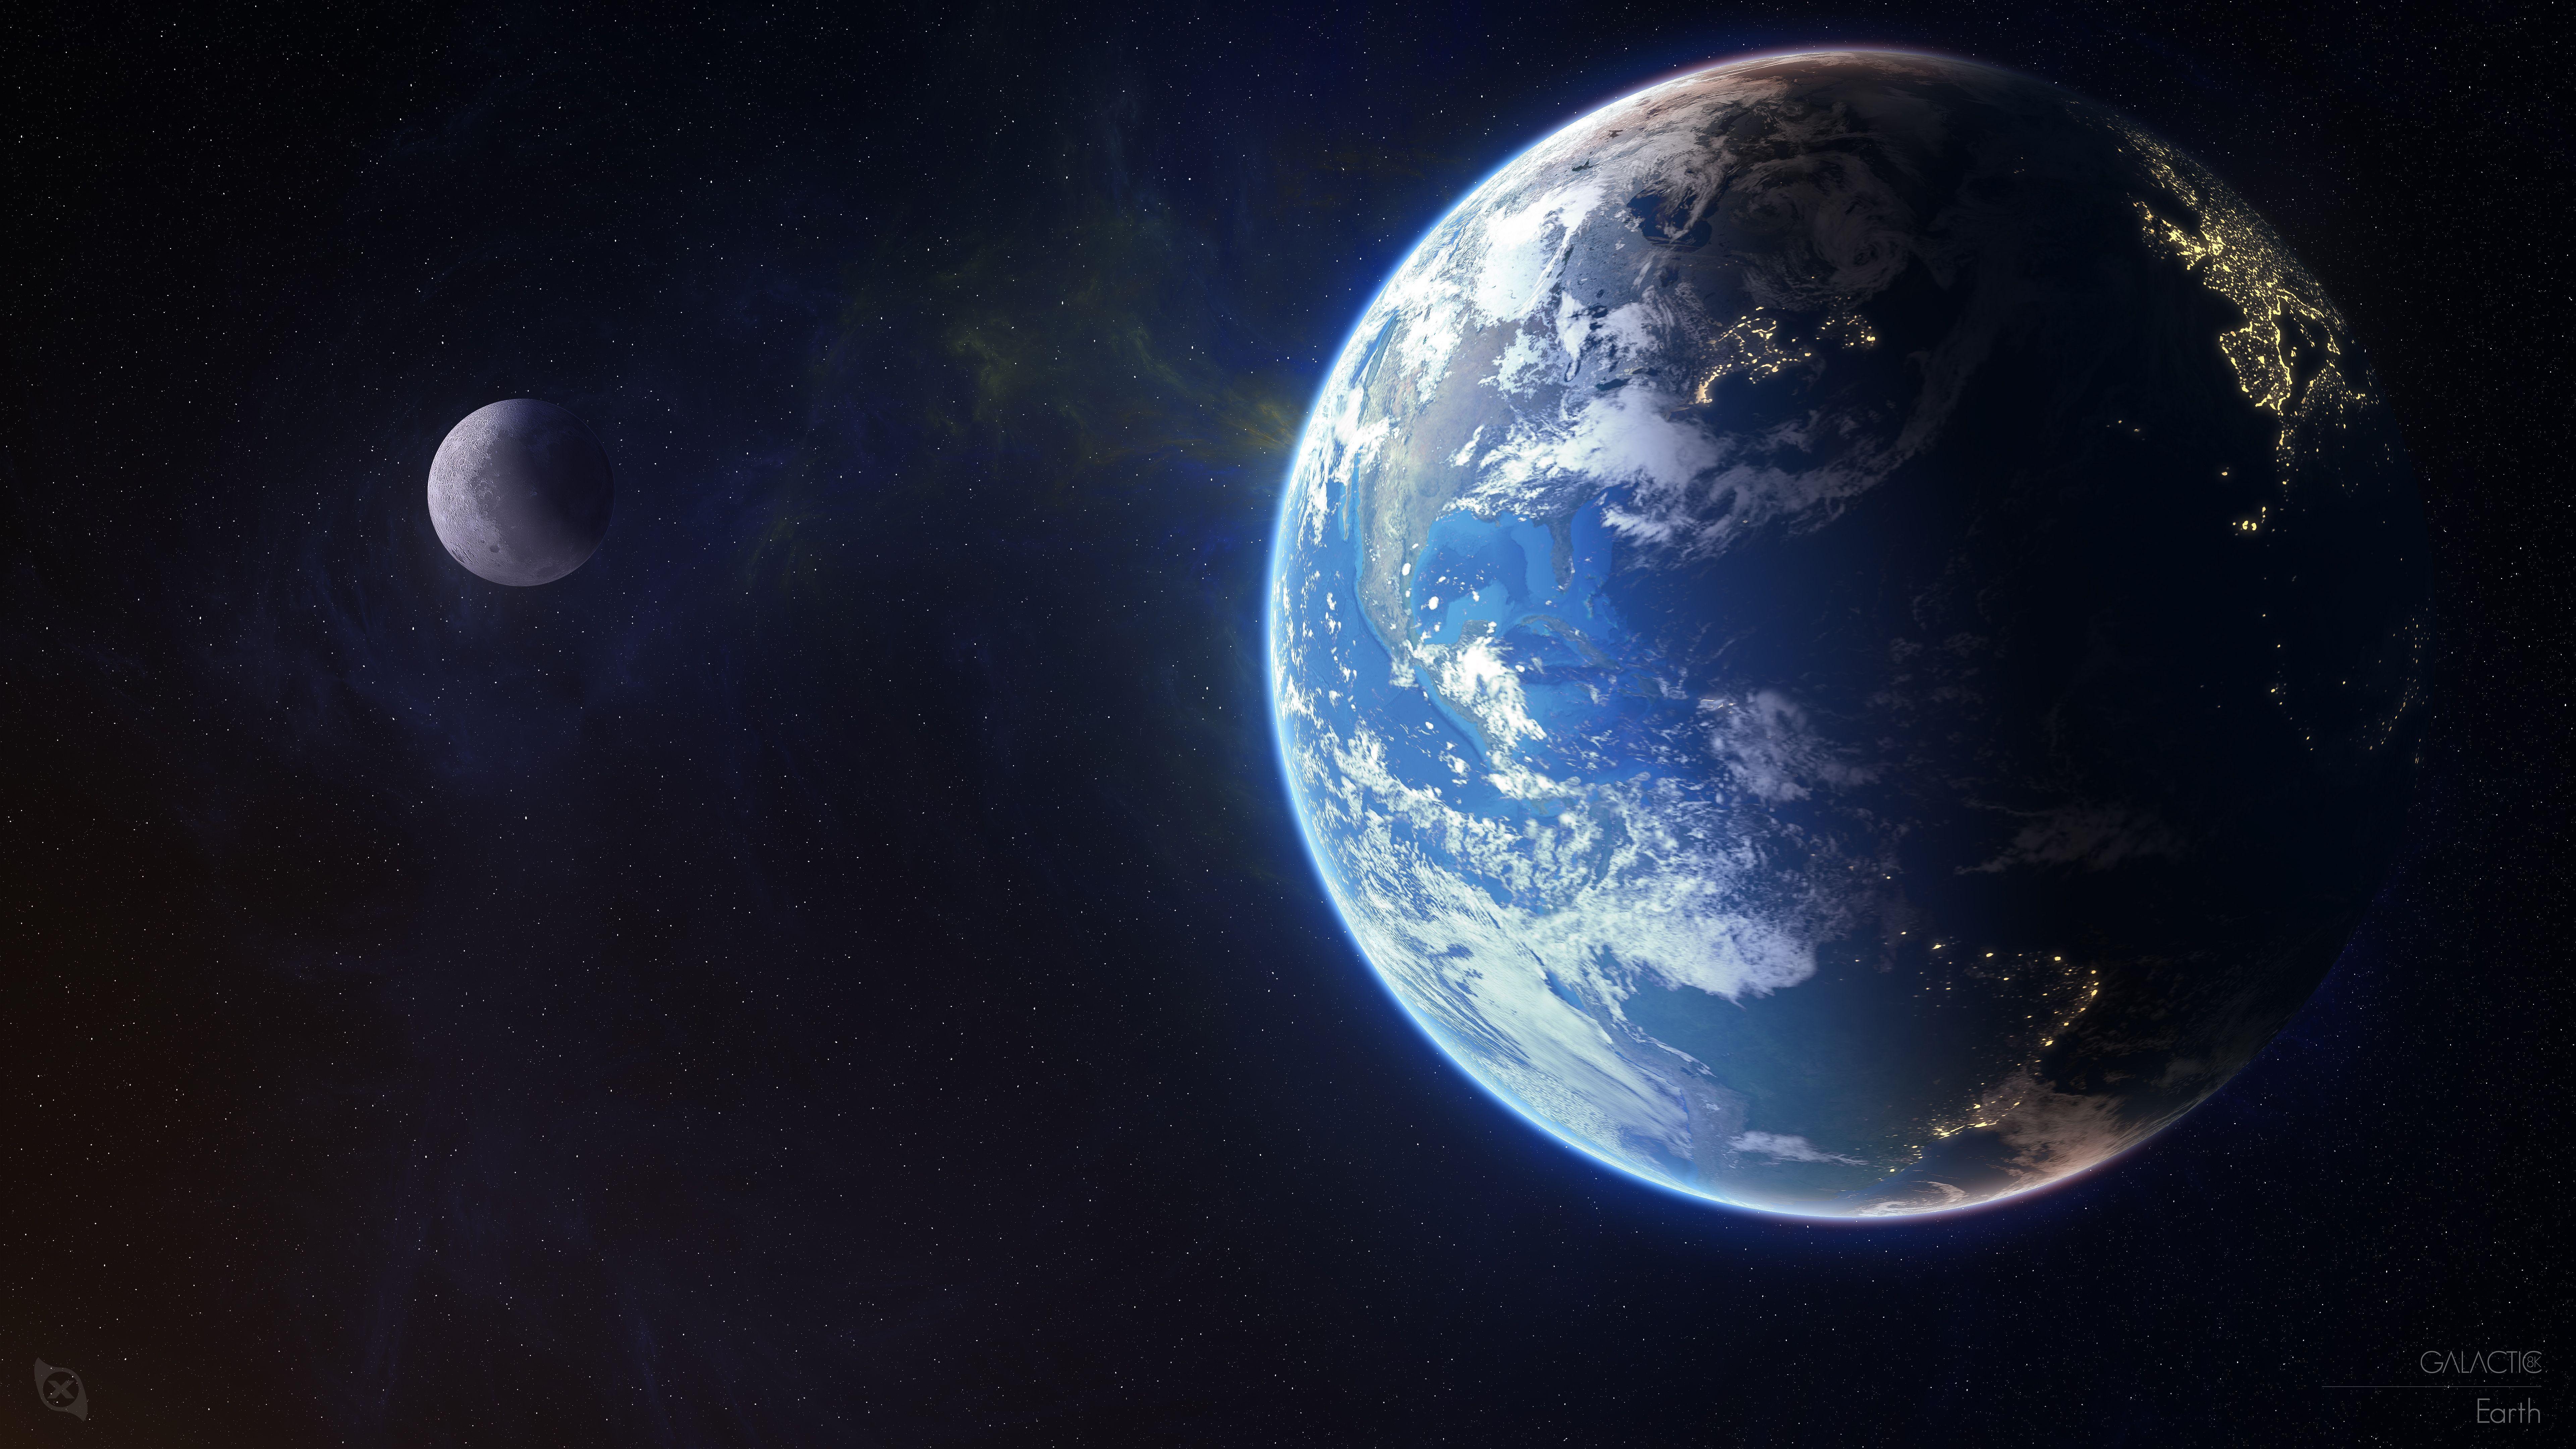 7680x4320 ورق جدران Earth ، Planet ، 4K ، 8K ، Space